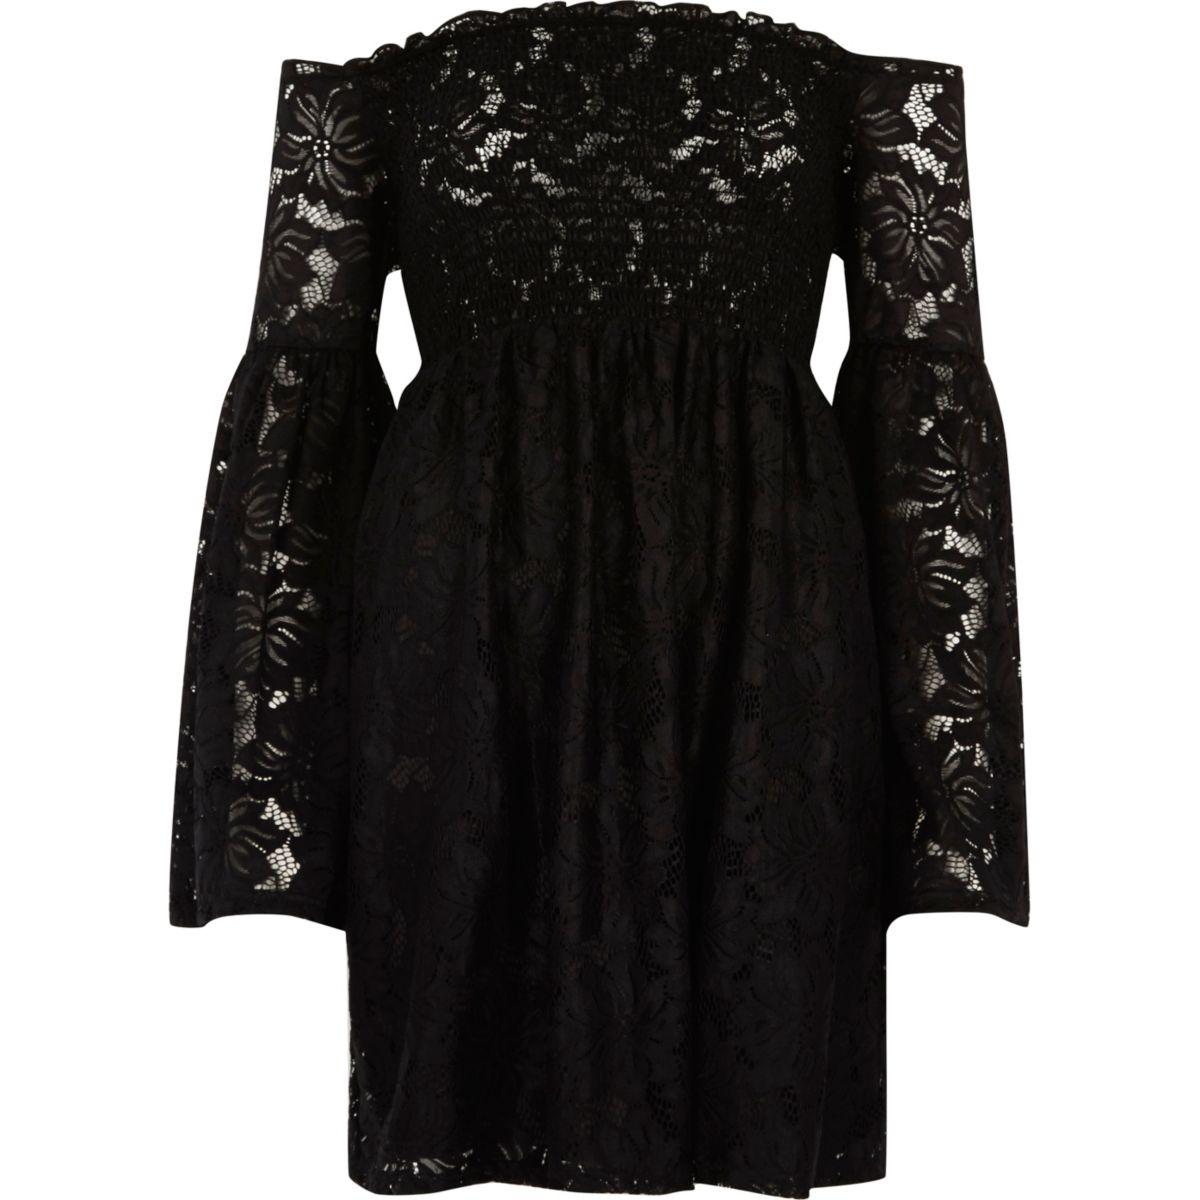 Black lace shirred bardot bell sleeve dress